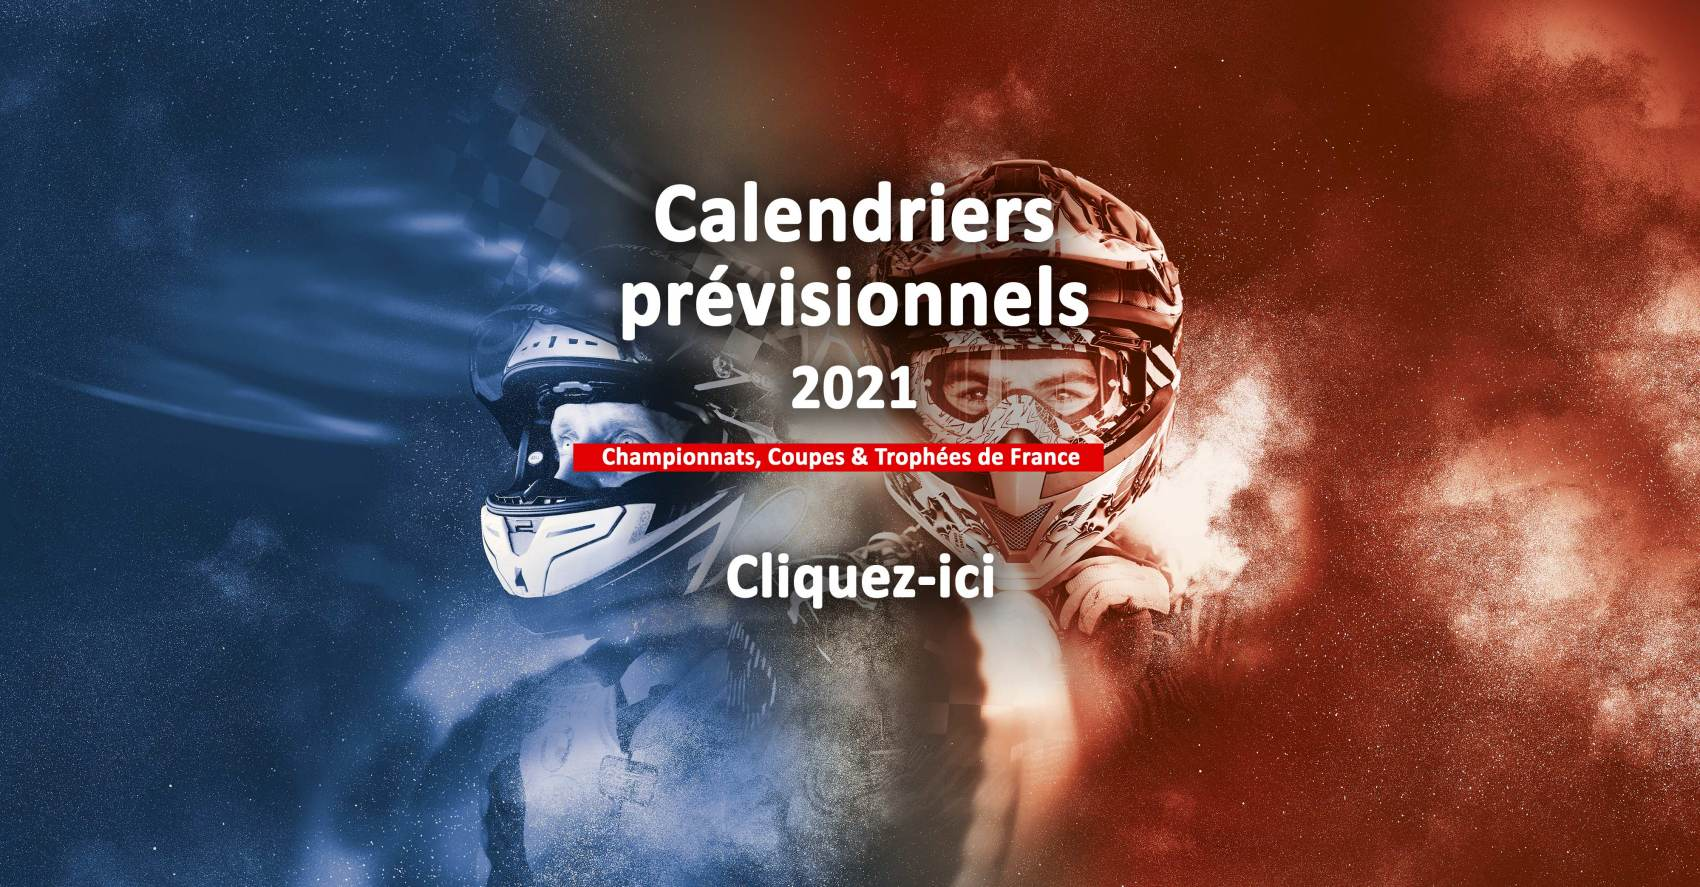 Calendrier Motocross Picardie 2021 Fédération Française de Motocyclisme | Site officiel FFM